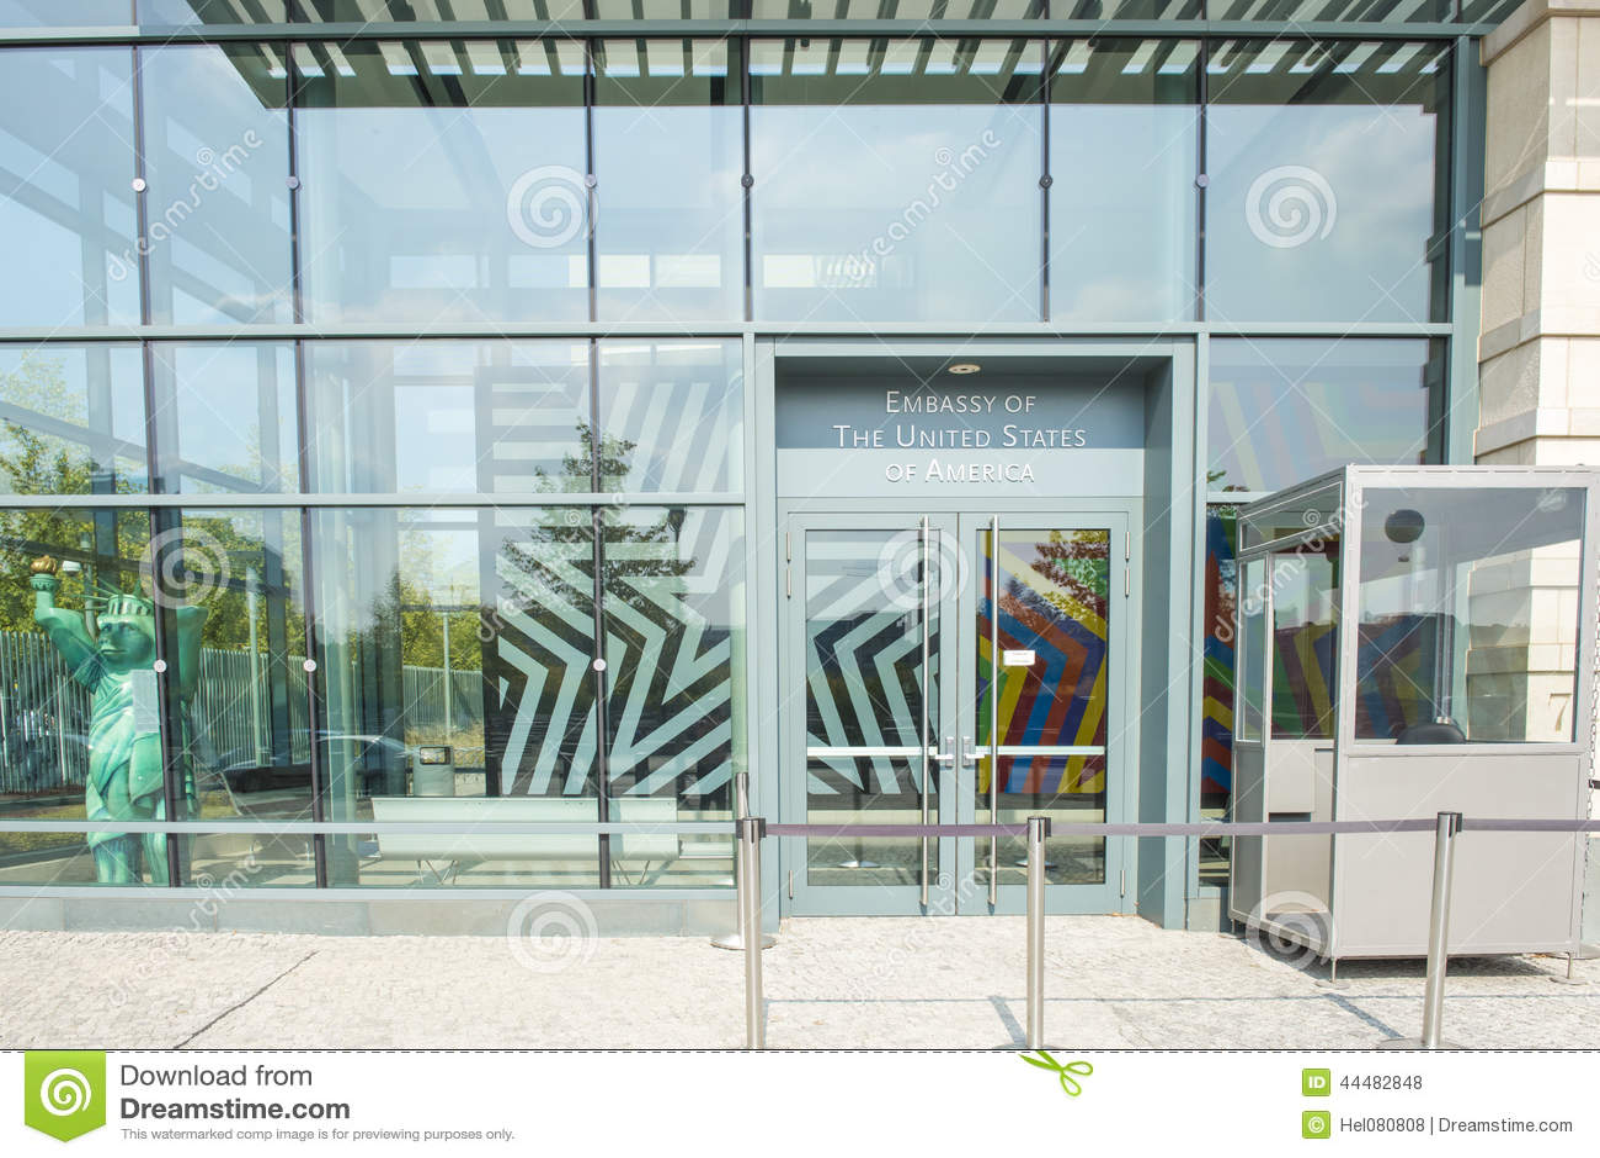 ambassade des usa berlin photo stock ditorial image 44482848. Black Bedroom Furniture Sets. Home Design Ideas